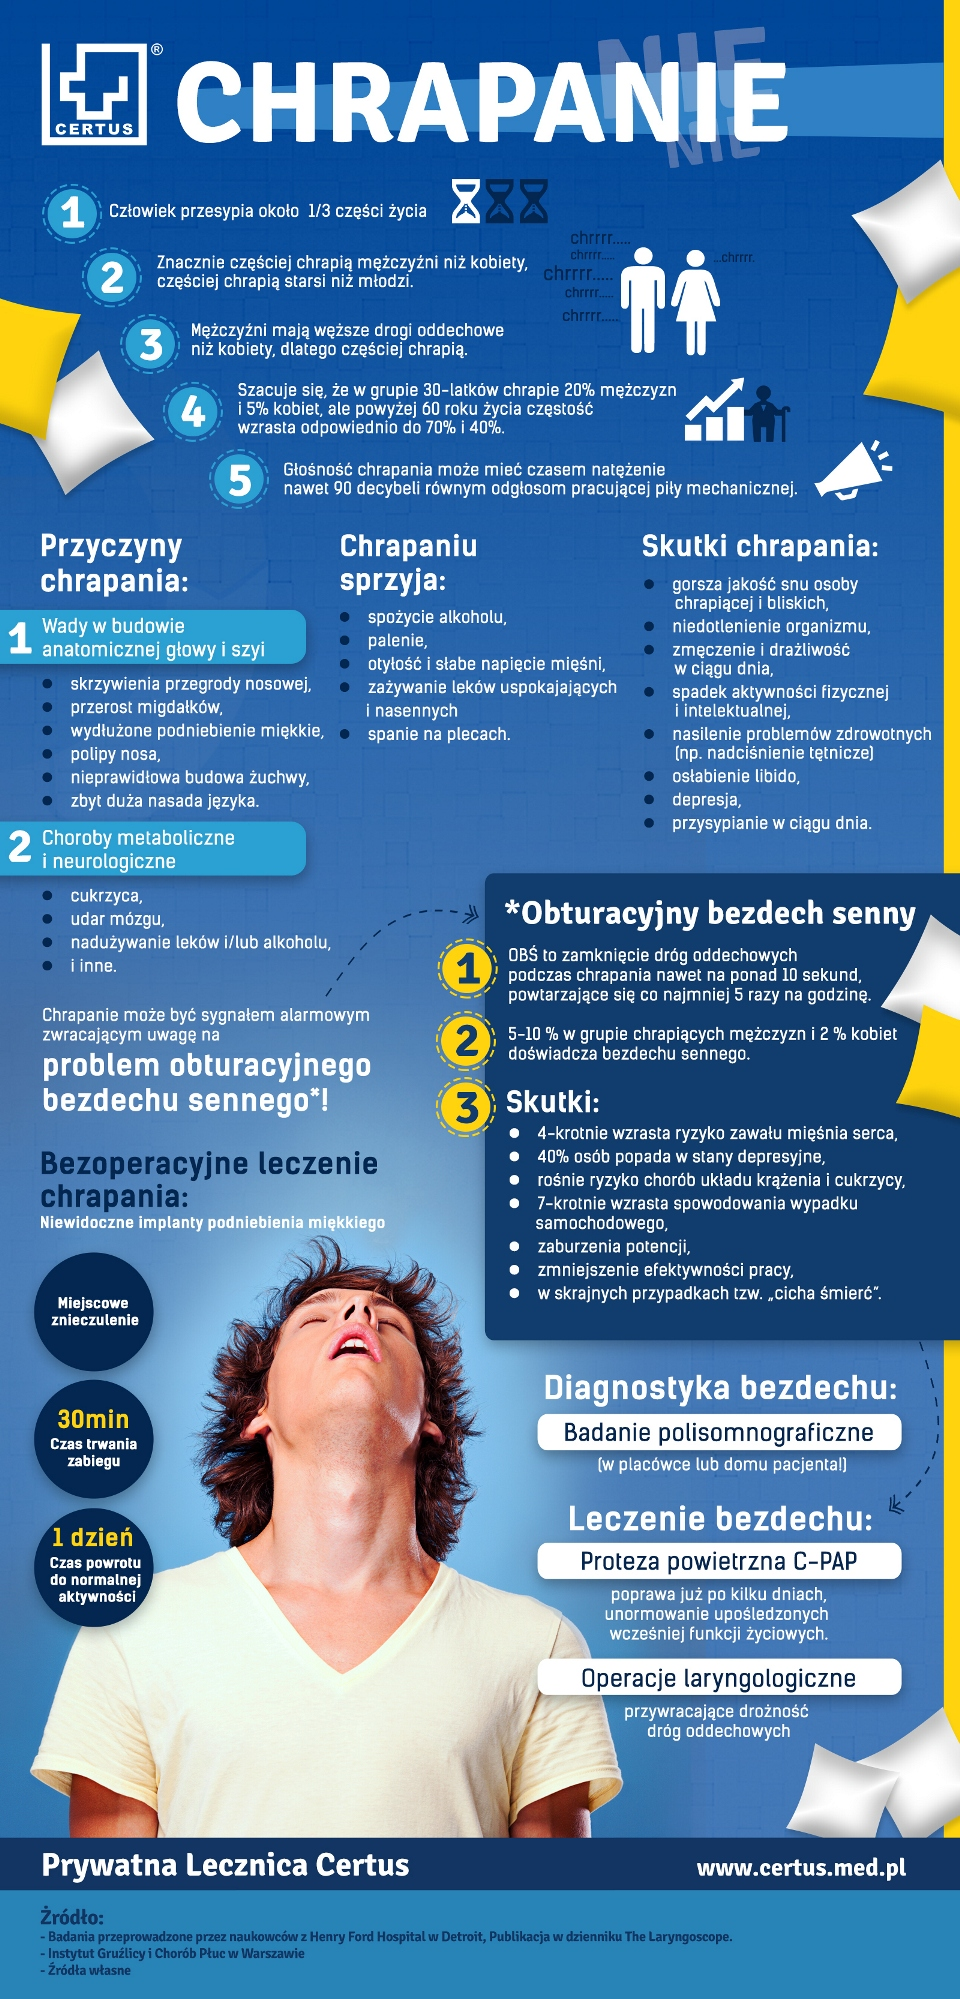 chrapanie_infografika